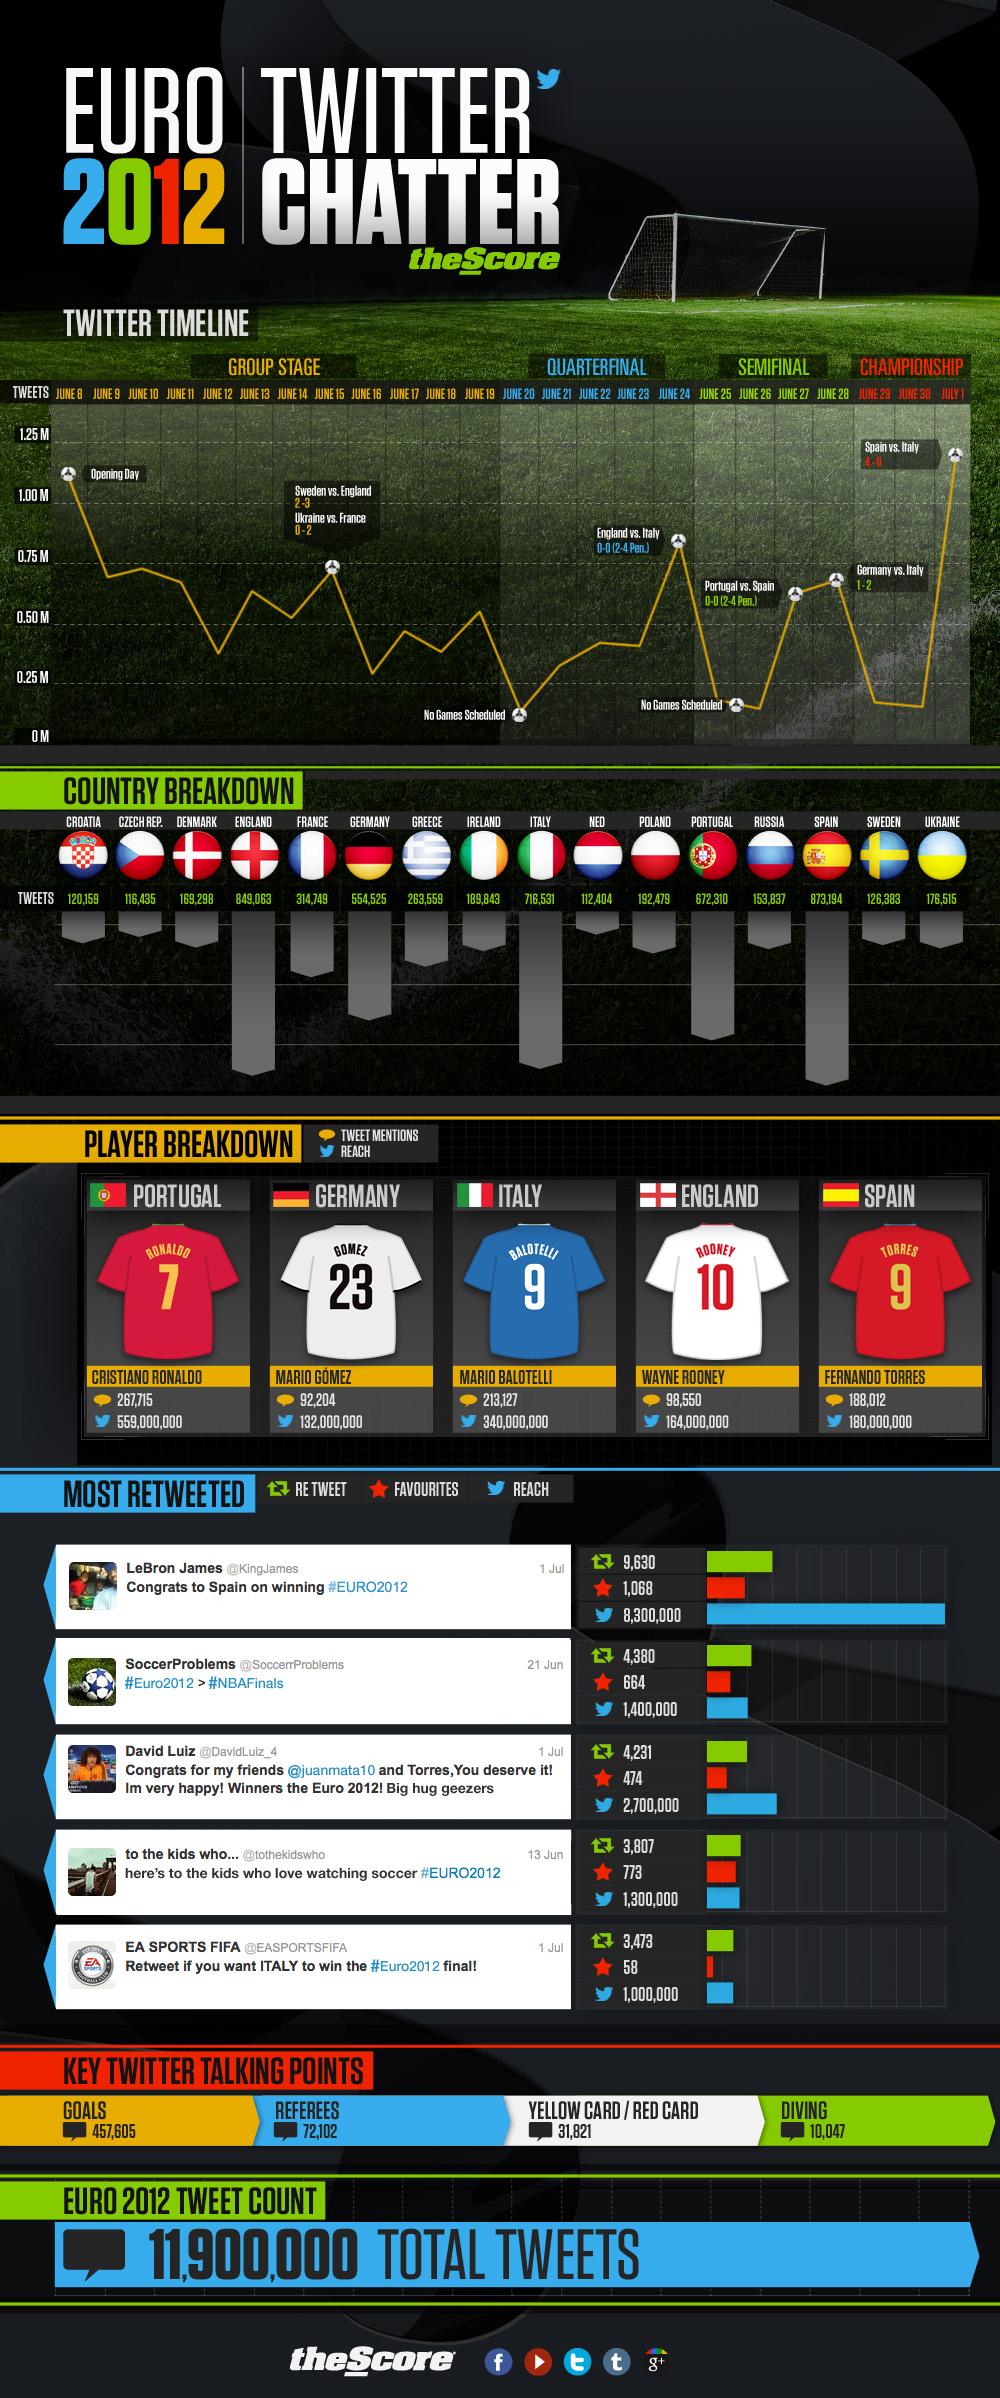 Euro 2012 Twitter Chatter